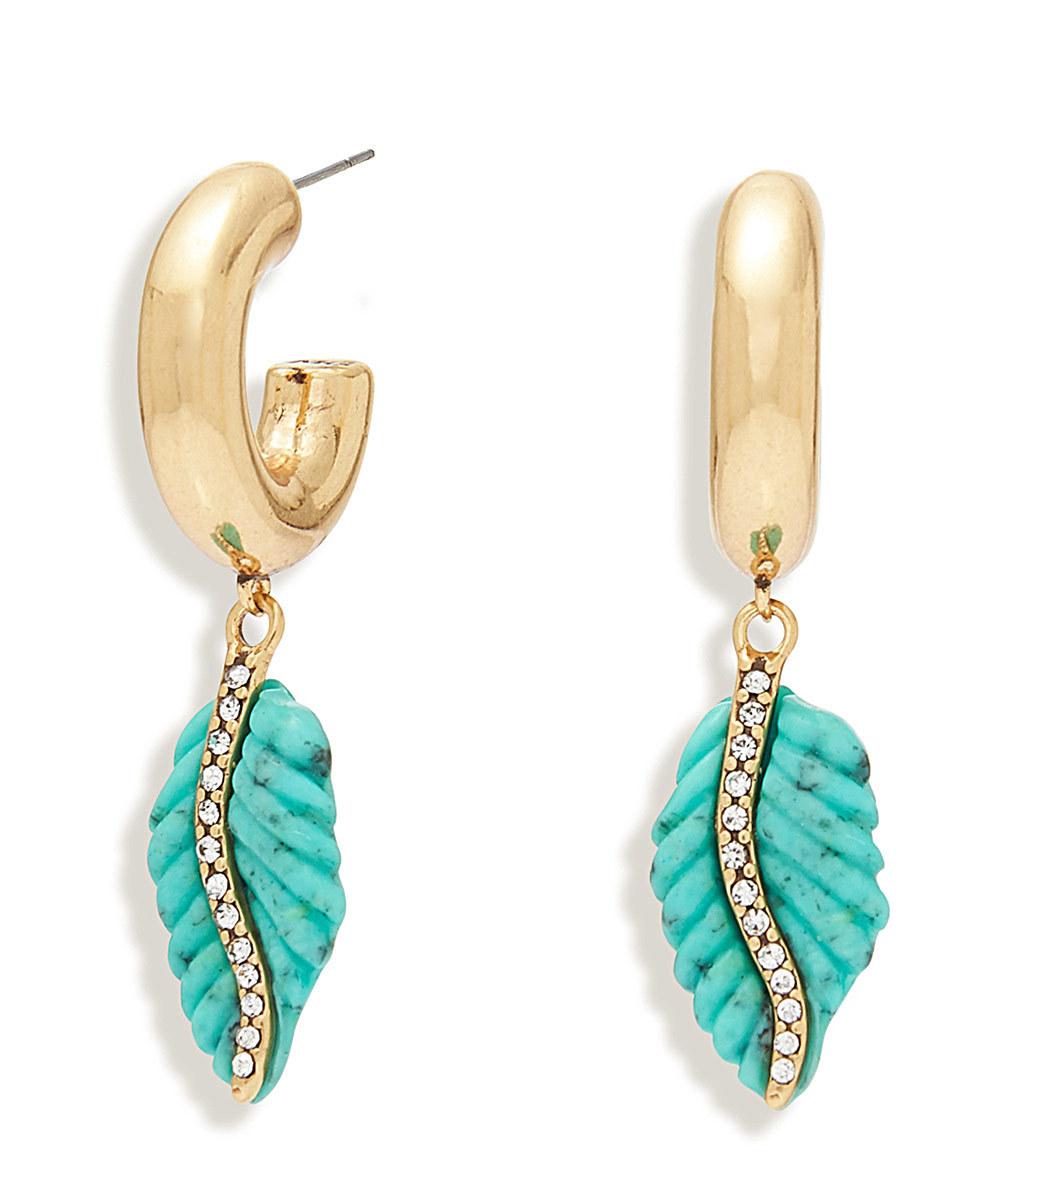 Mignonne Gavigan Serenity Earrings Turquoise